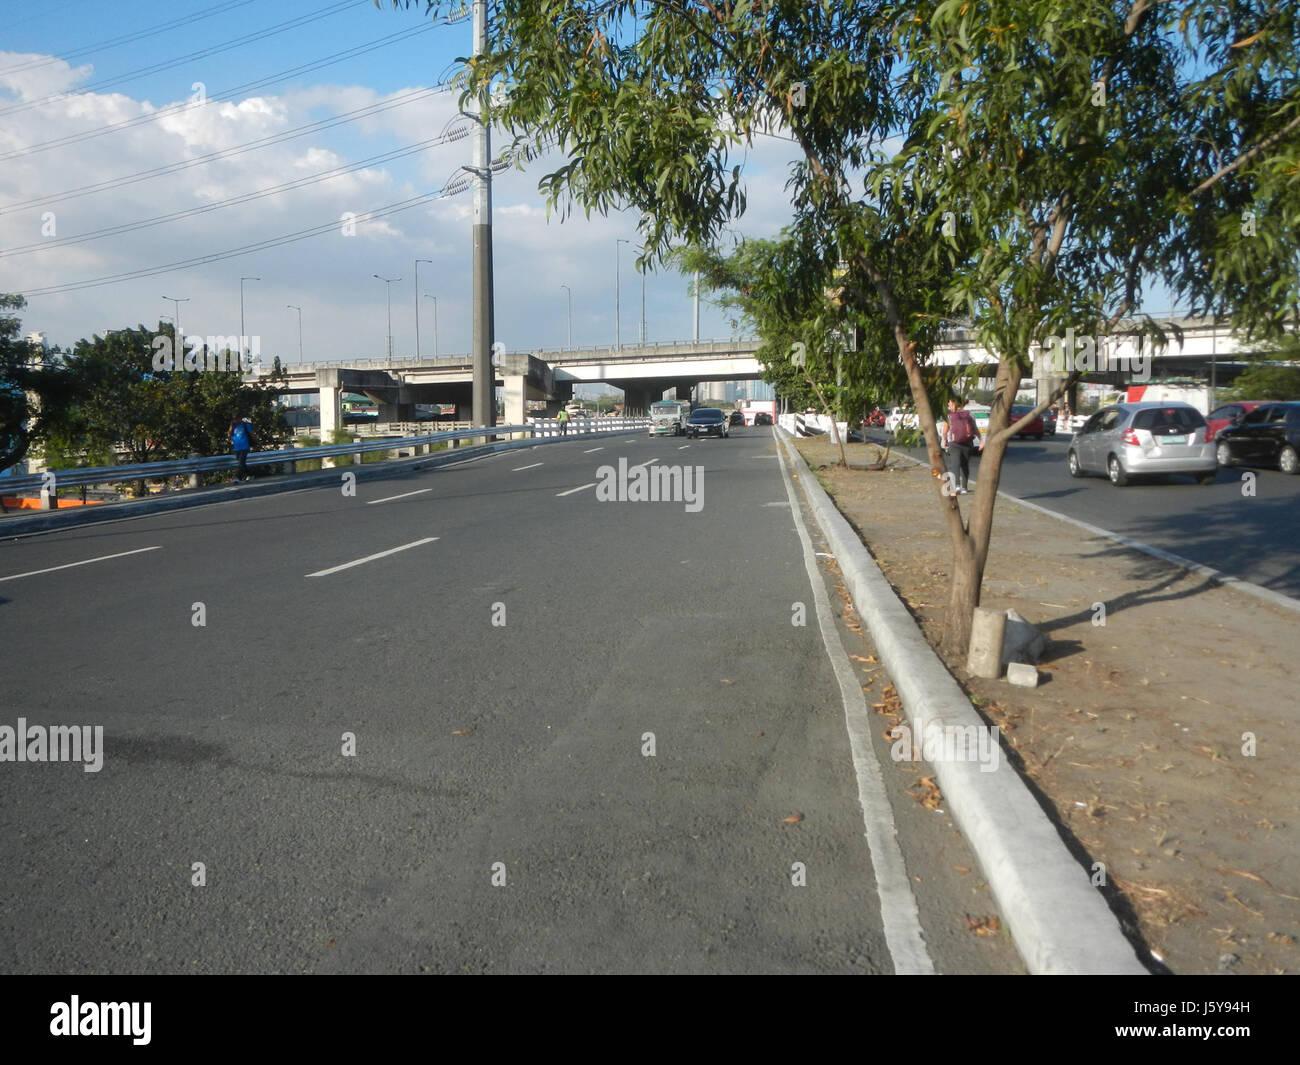 04336 Sales Interchange Taguig Pasay City  12 - Stock Image